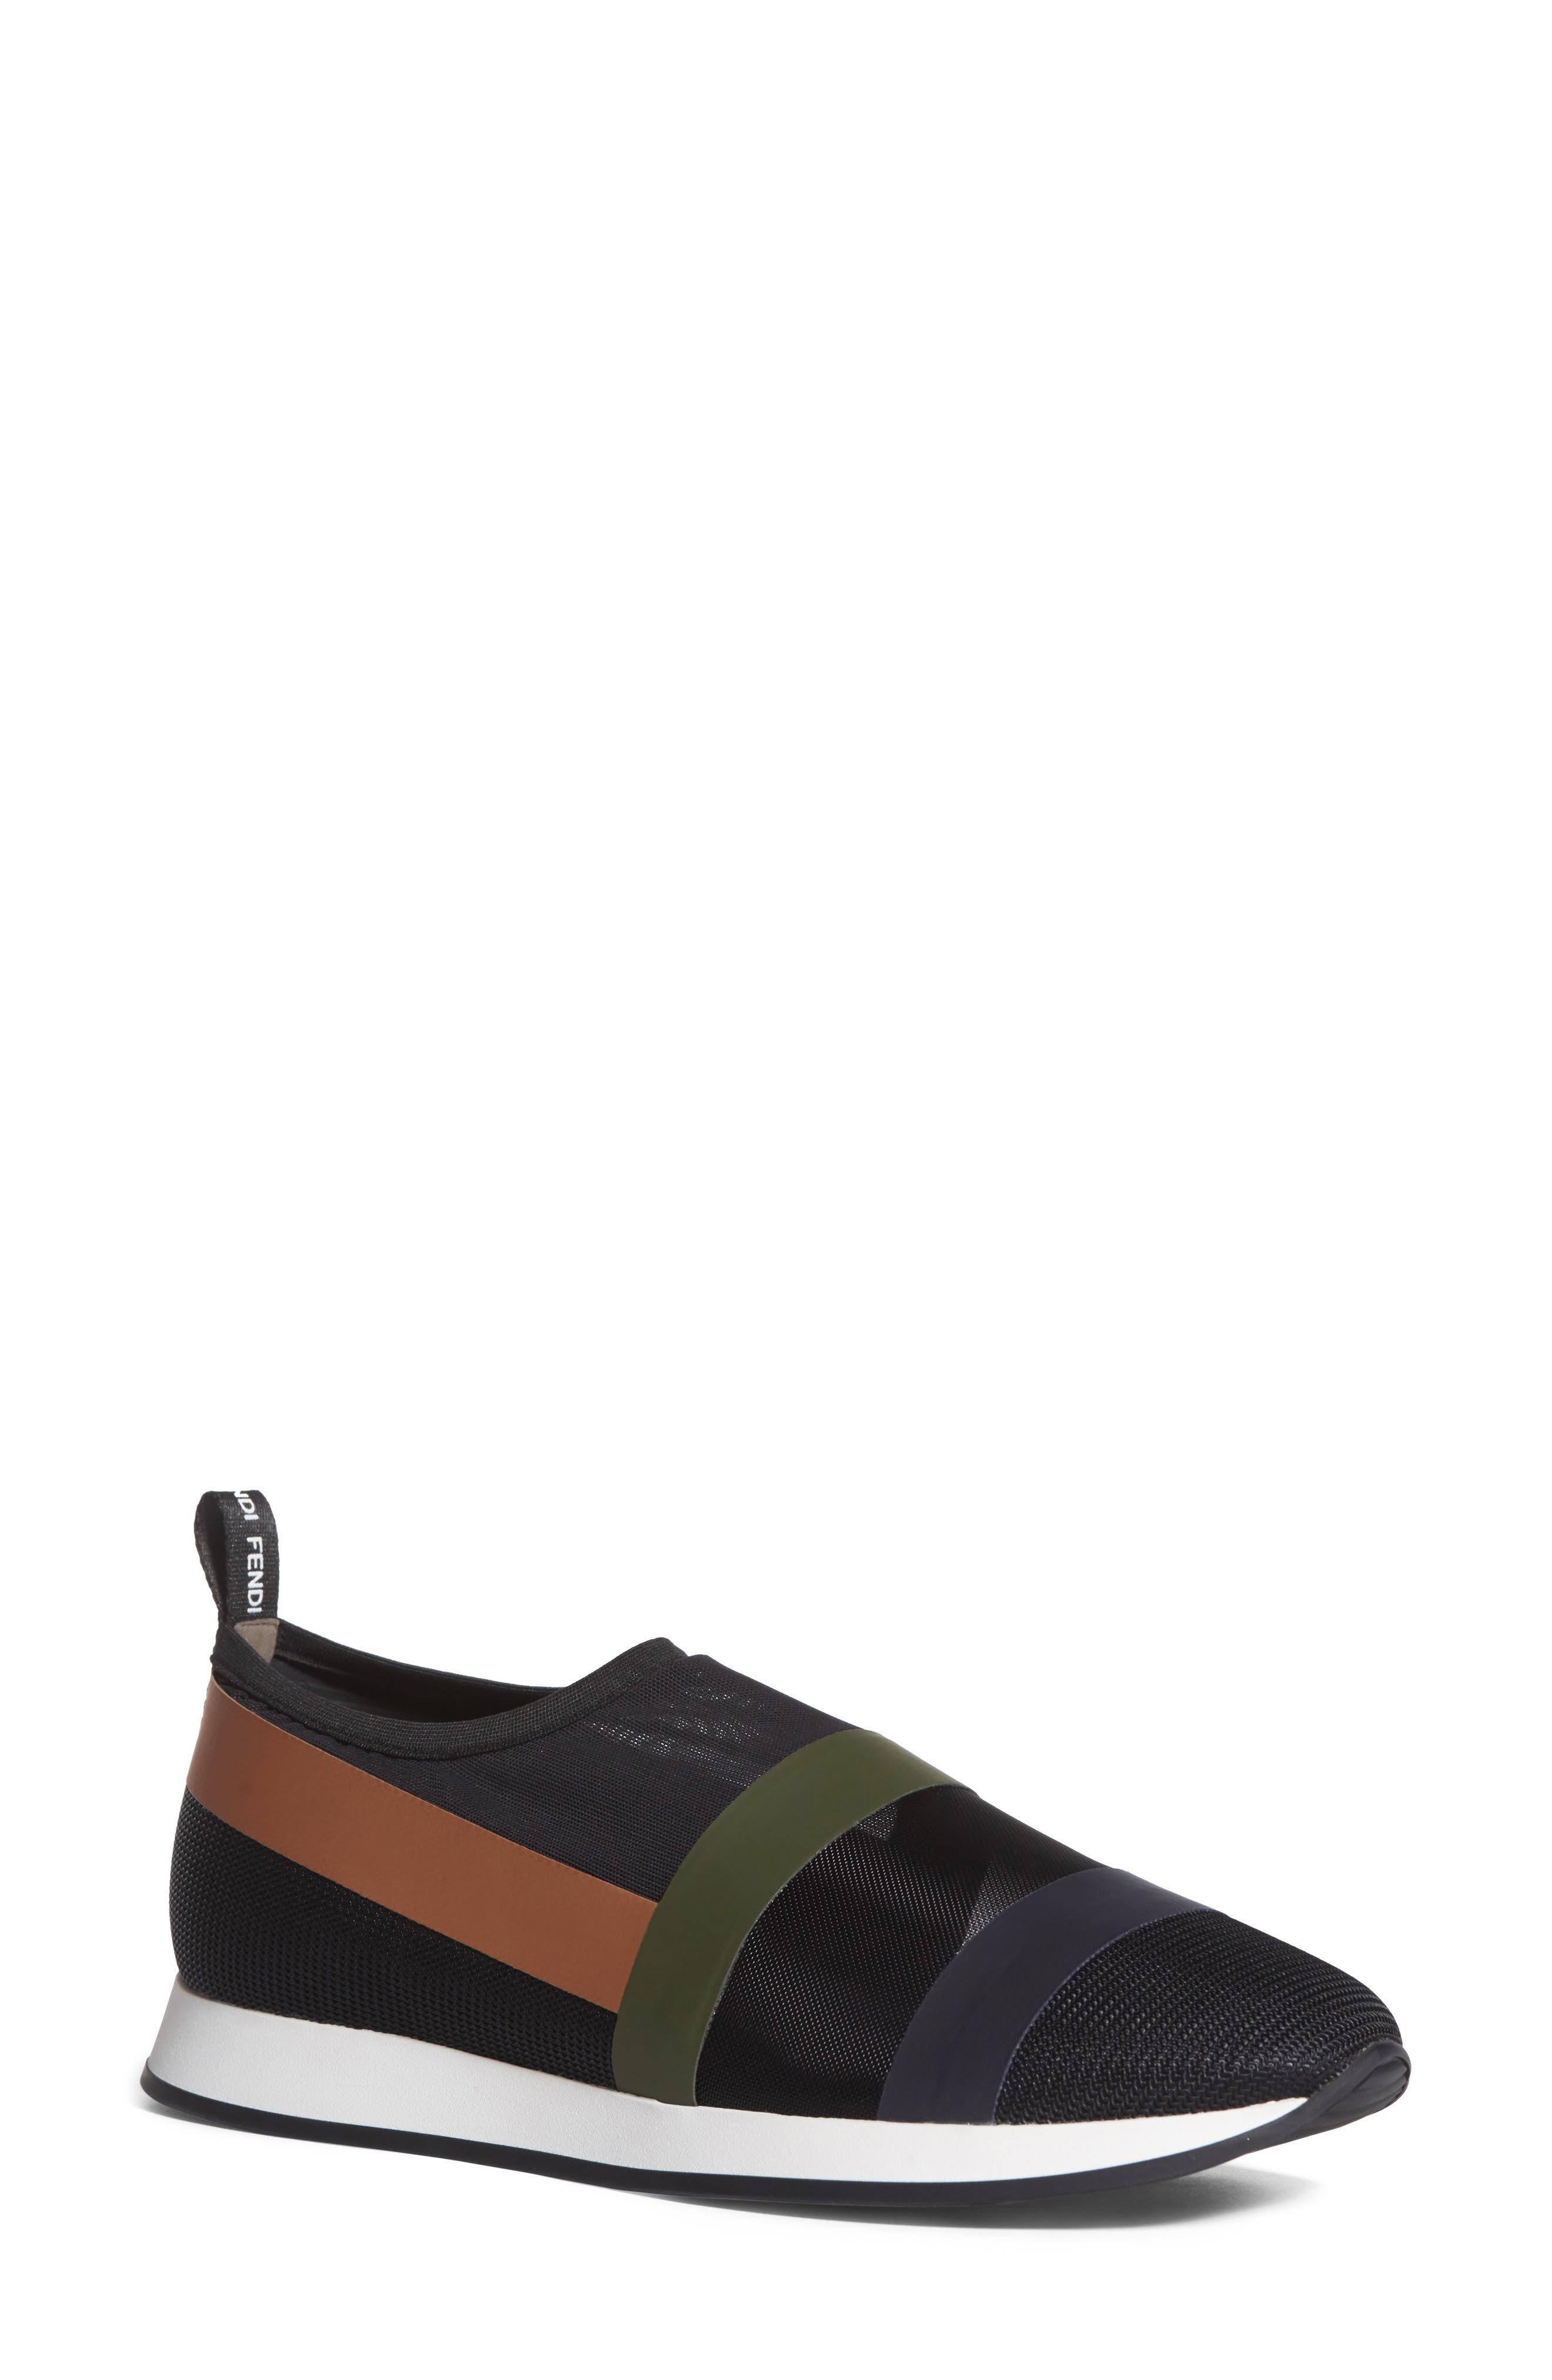 Slip-On Sneaker,                         Main,                         color, Black/ Beige